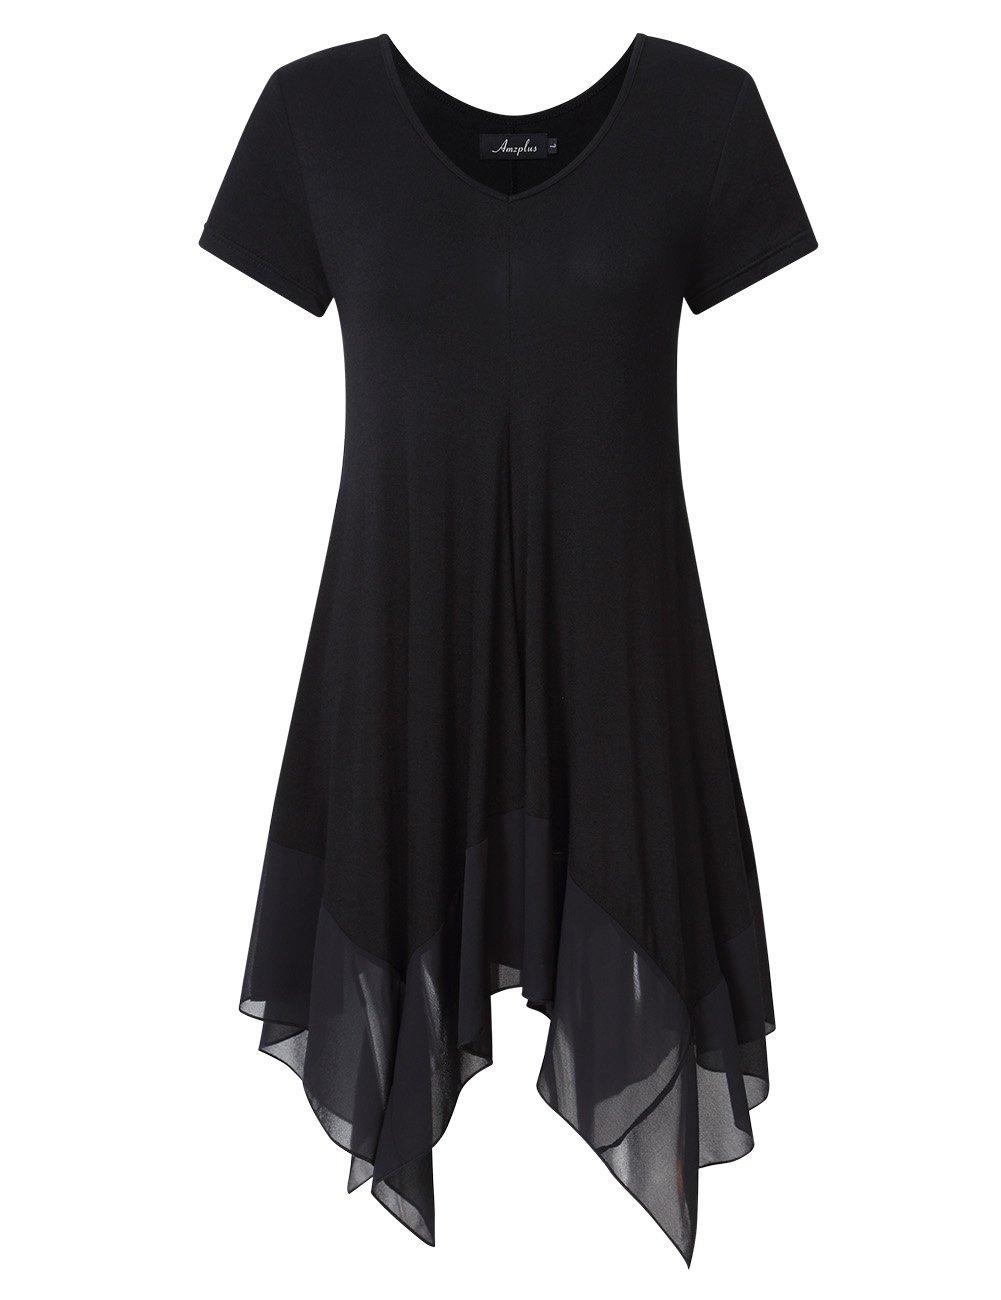 AMZ PLUS Womens Plus Size Short Sleeve Spliced Asymmetrical Tunic Top Black 3XL